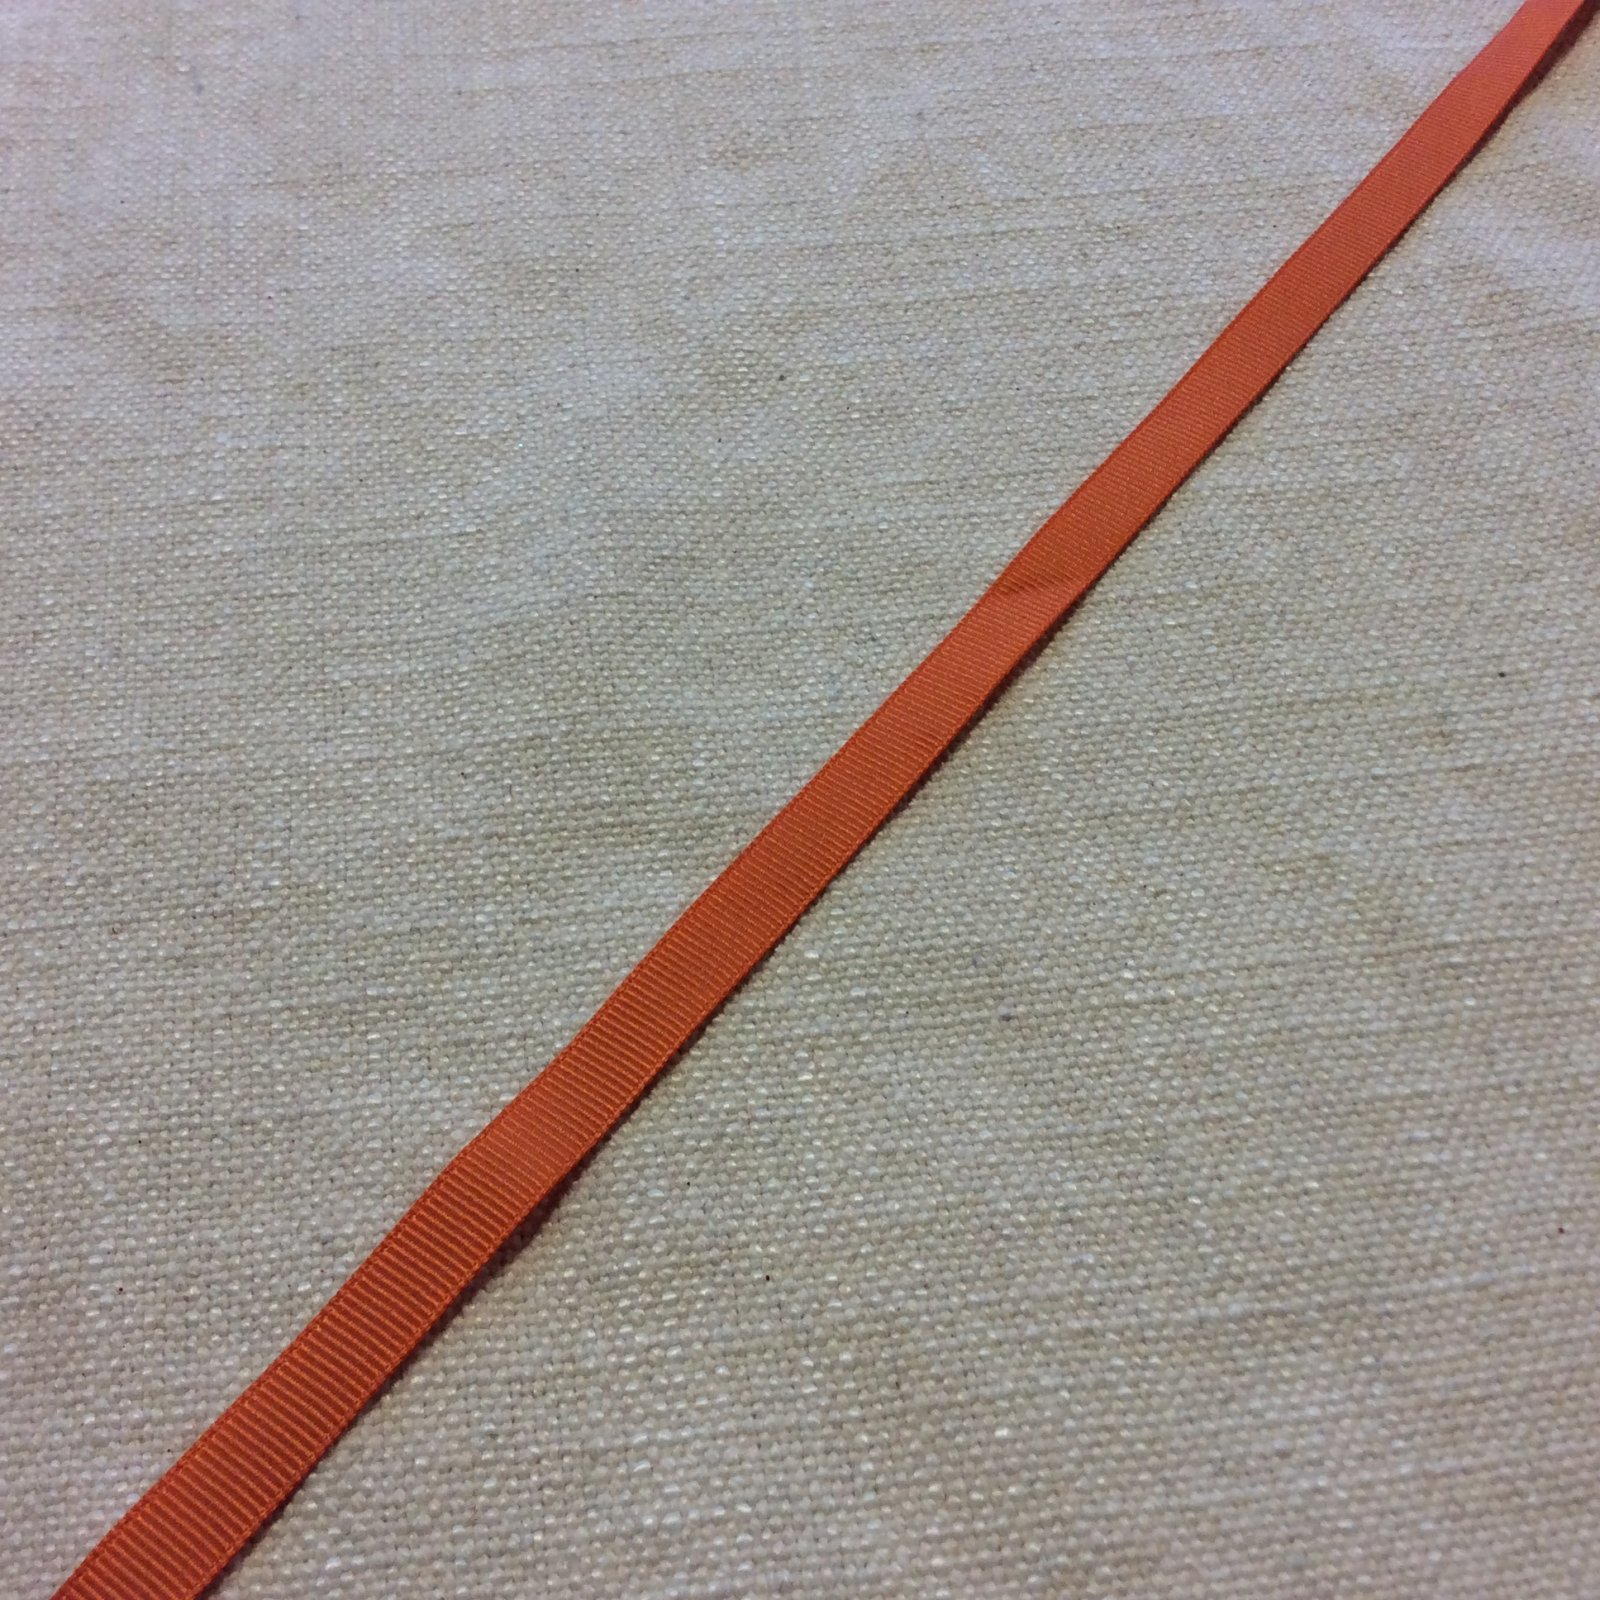 Grosgrain Ribbon 3/8 Light Orange Trim Ribbon RIB1146